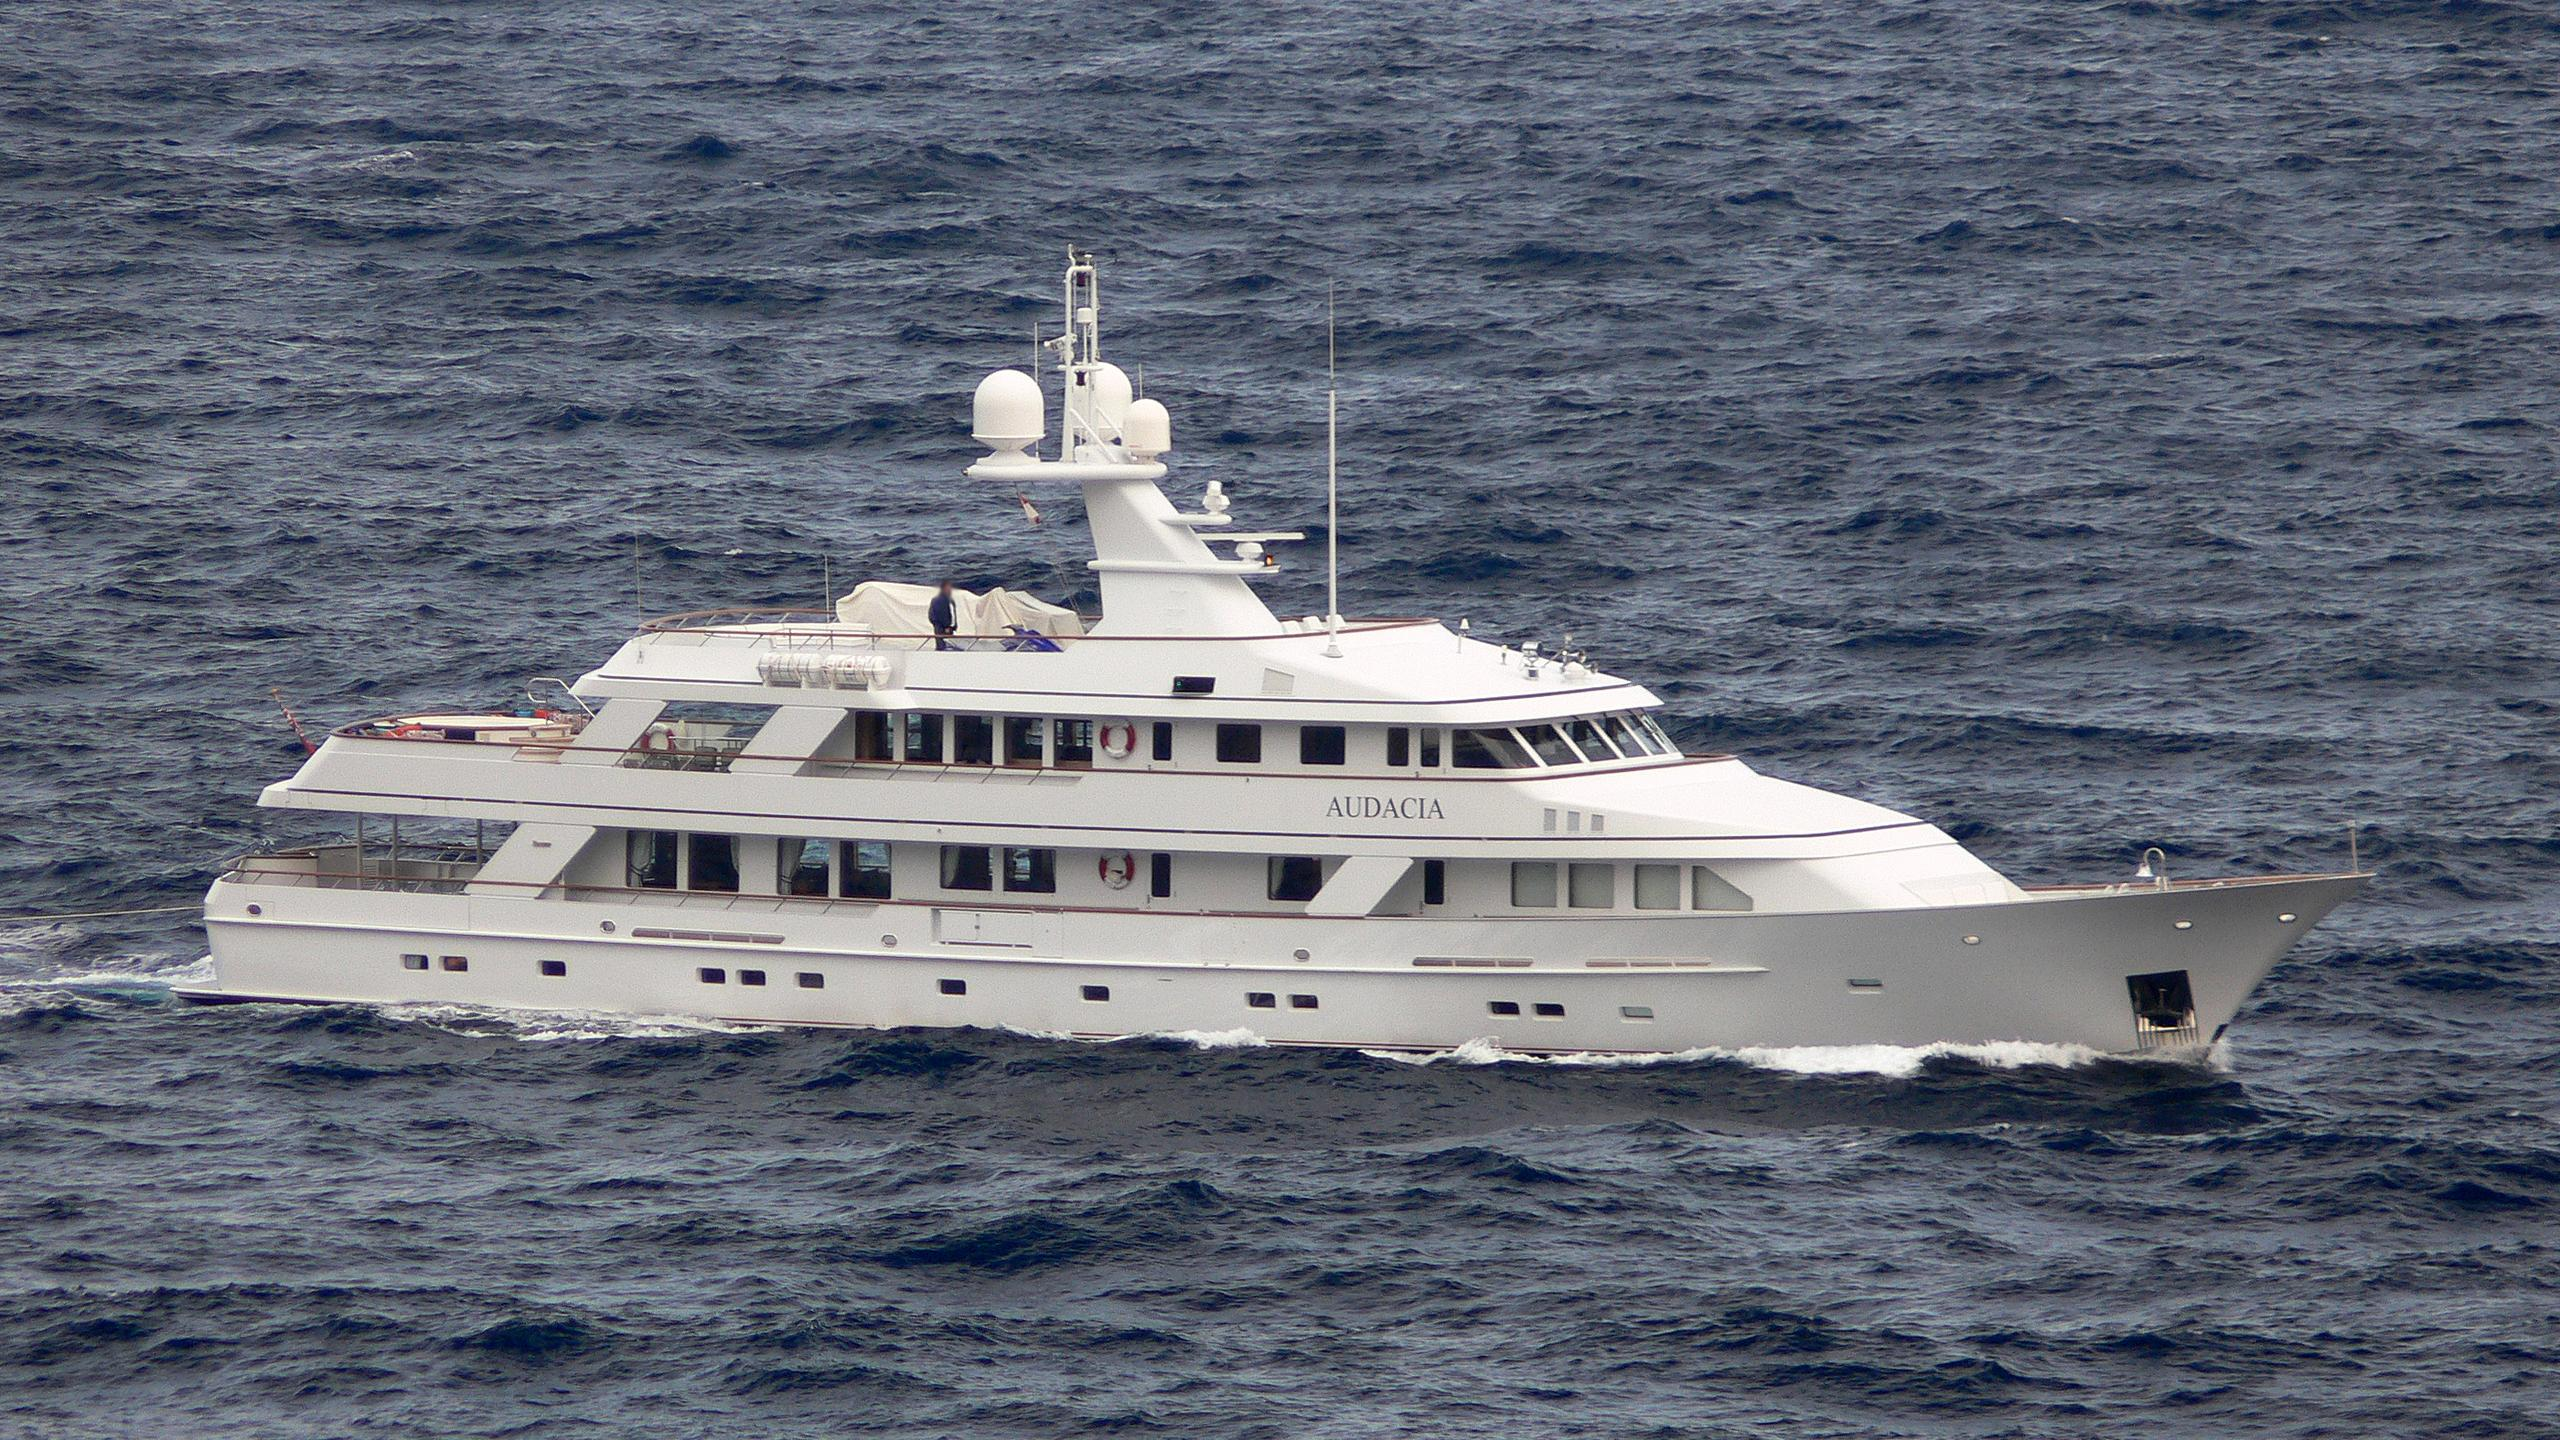 audacia-yacht-exterior